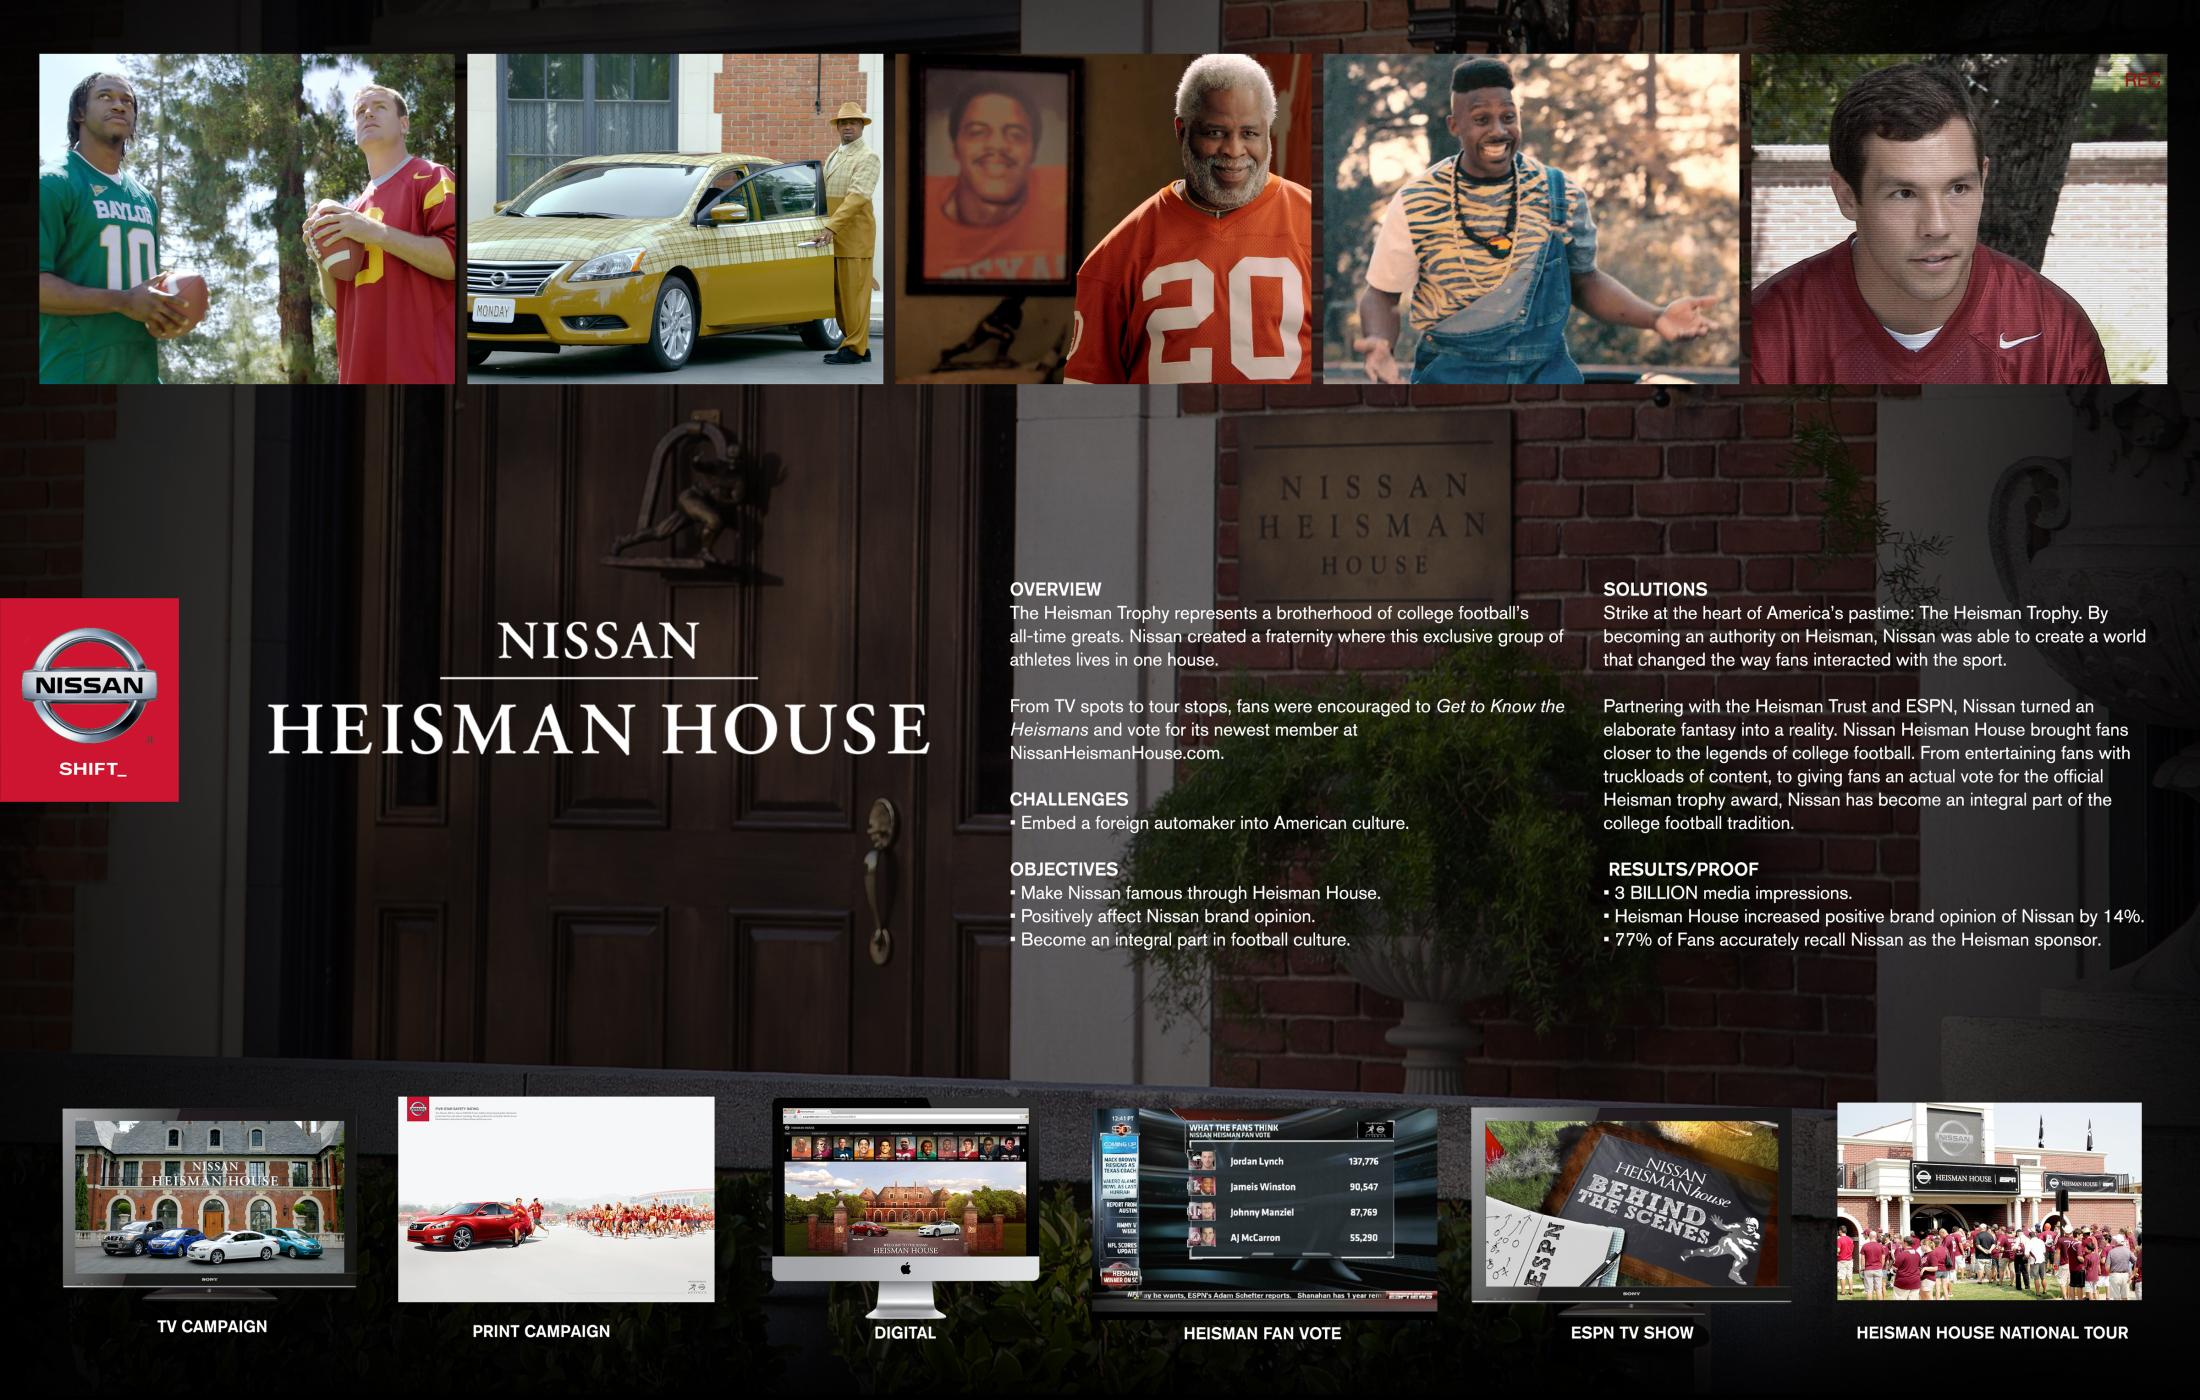 Thumbnail for Heisman House